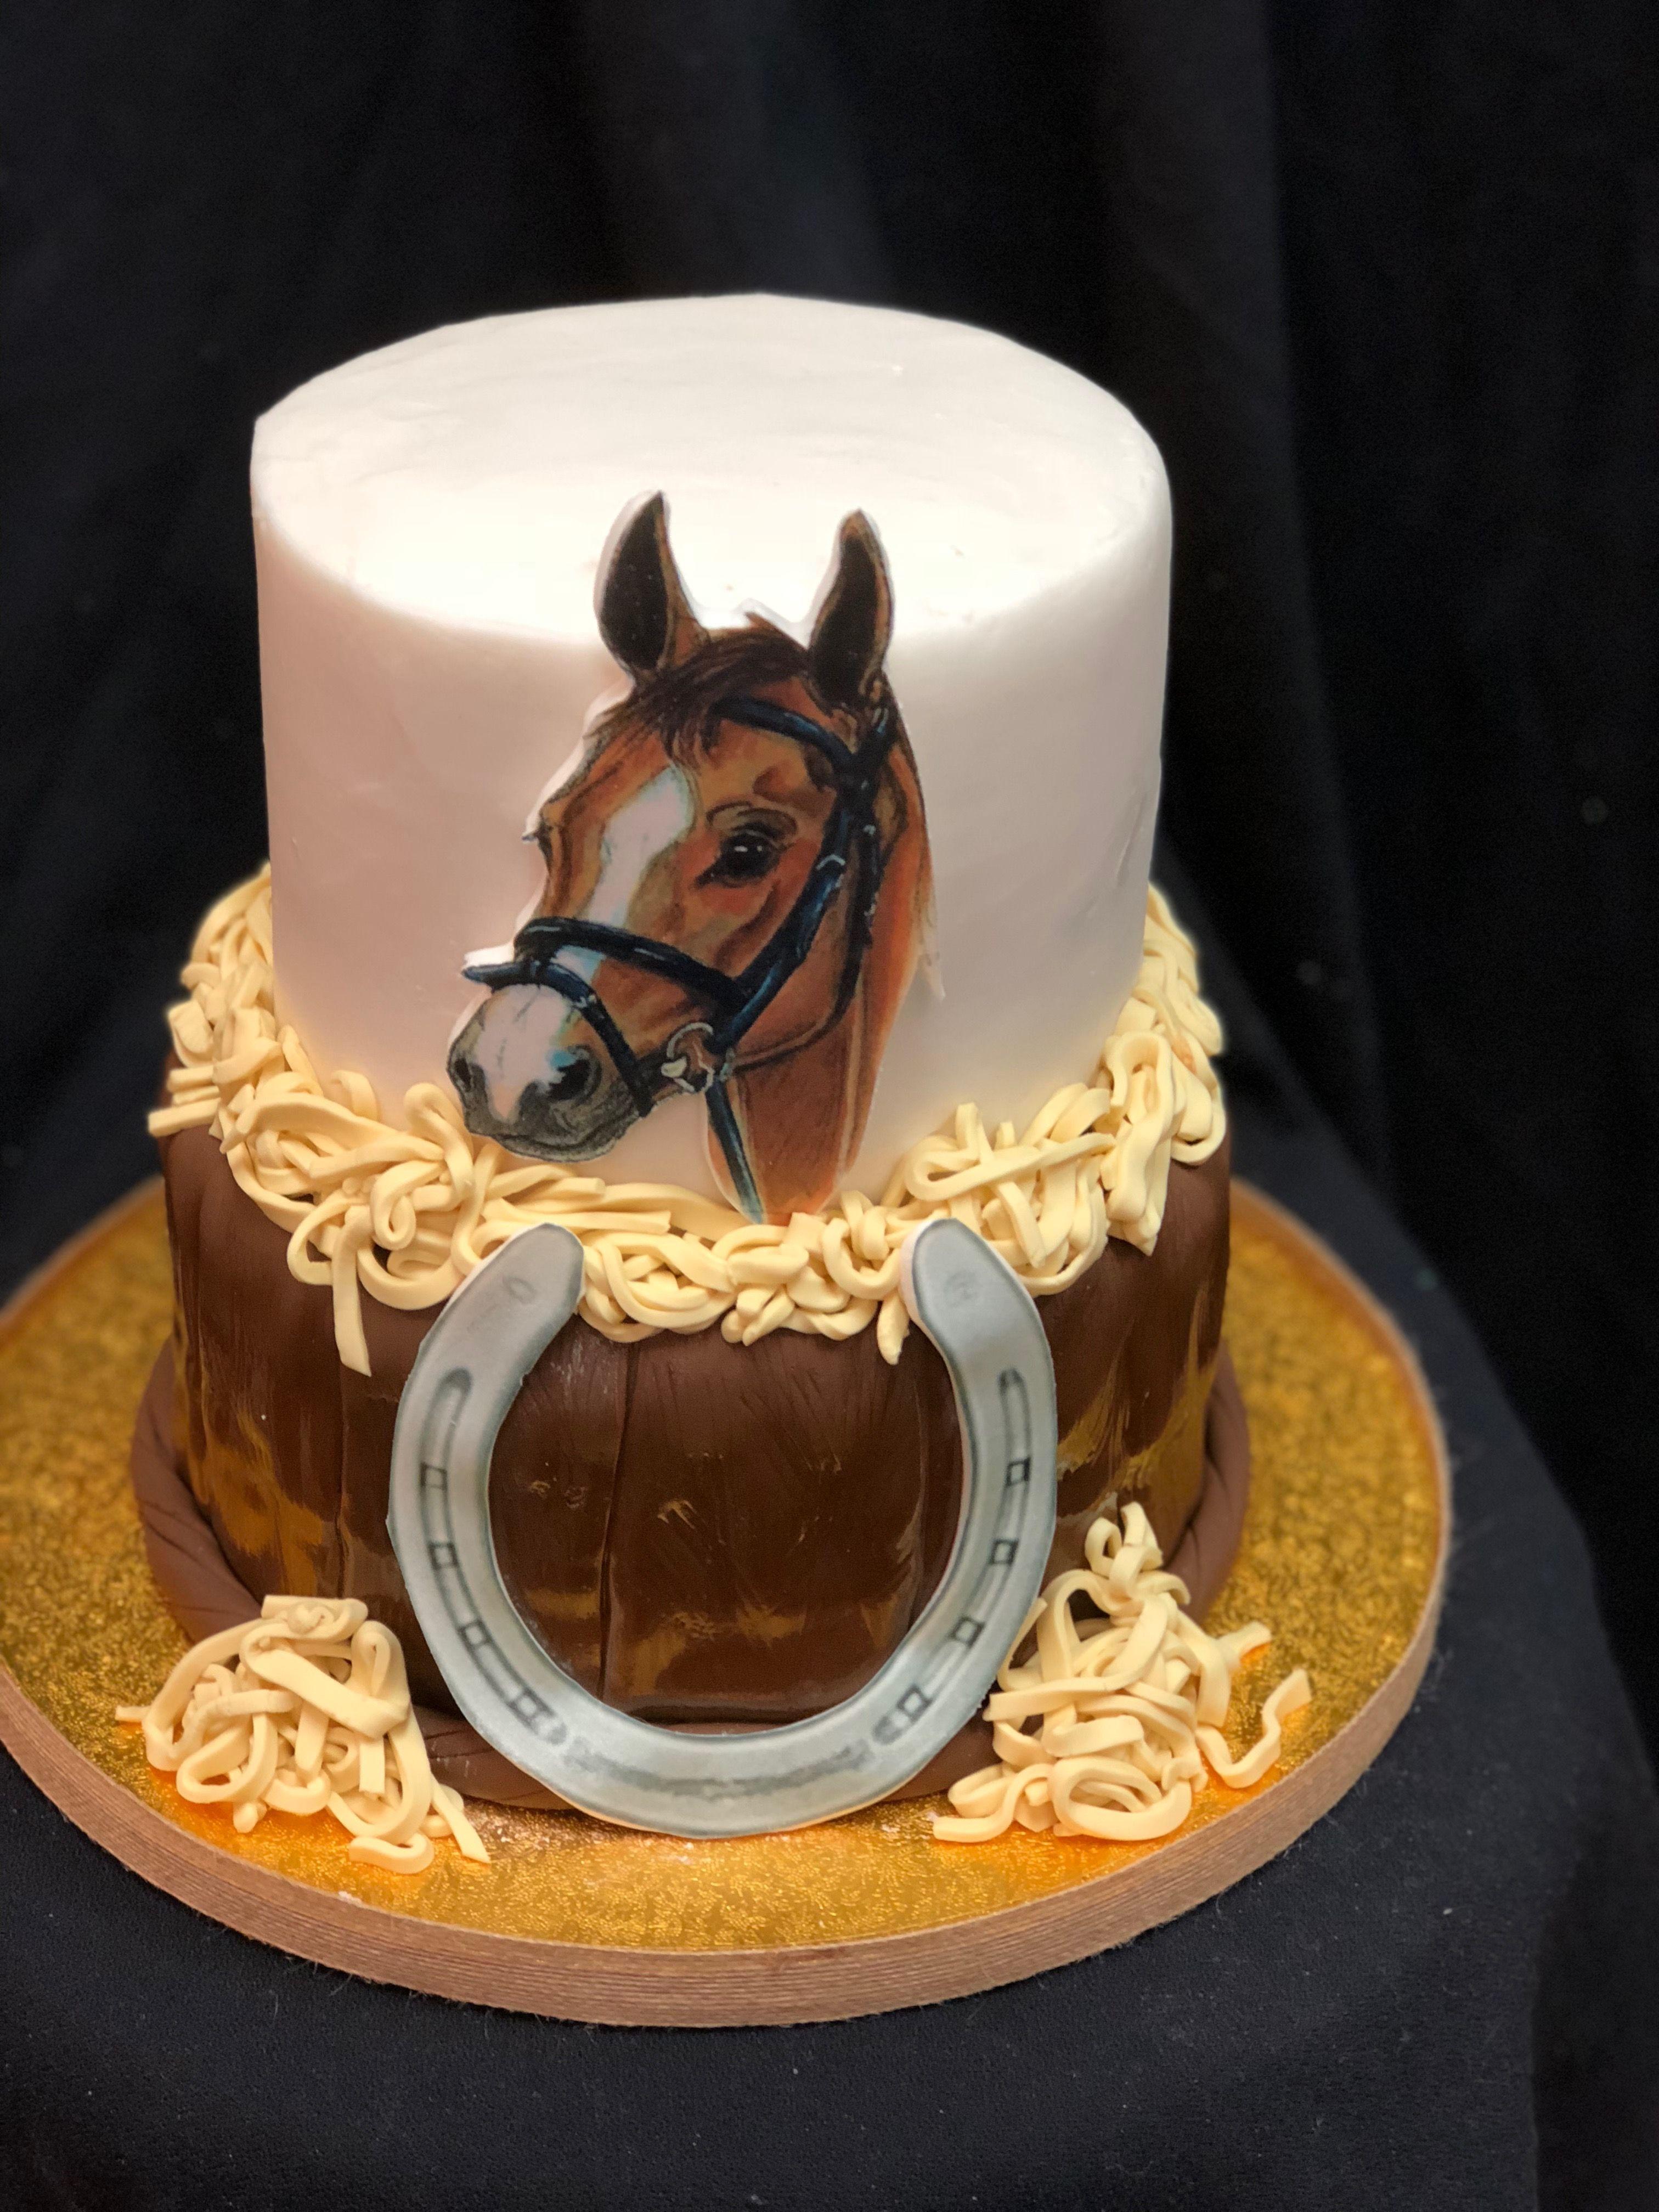 Tremendous I Love My Horse Cake Horse Birthday Cake Horse Cake Cowboy Personalised Birthday Cards Cominlily Jamesorg